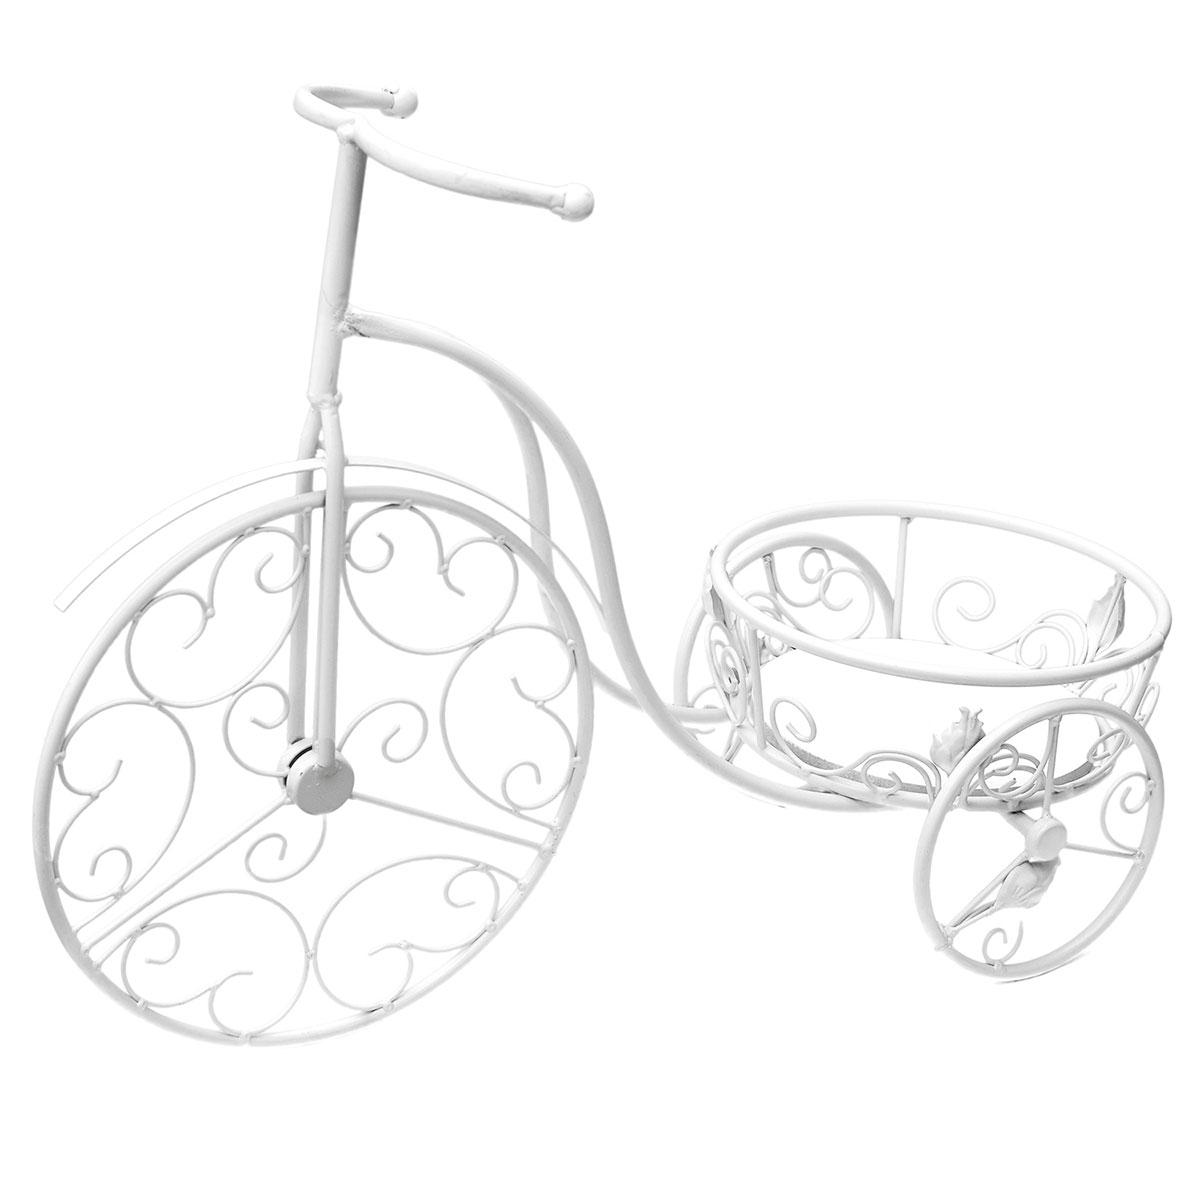 Metall Fahrrad zum bepflanzen Pflanzfahrrad Dekofahrrad Blumentopf Pflanztopf